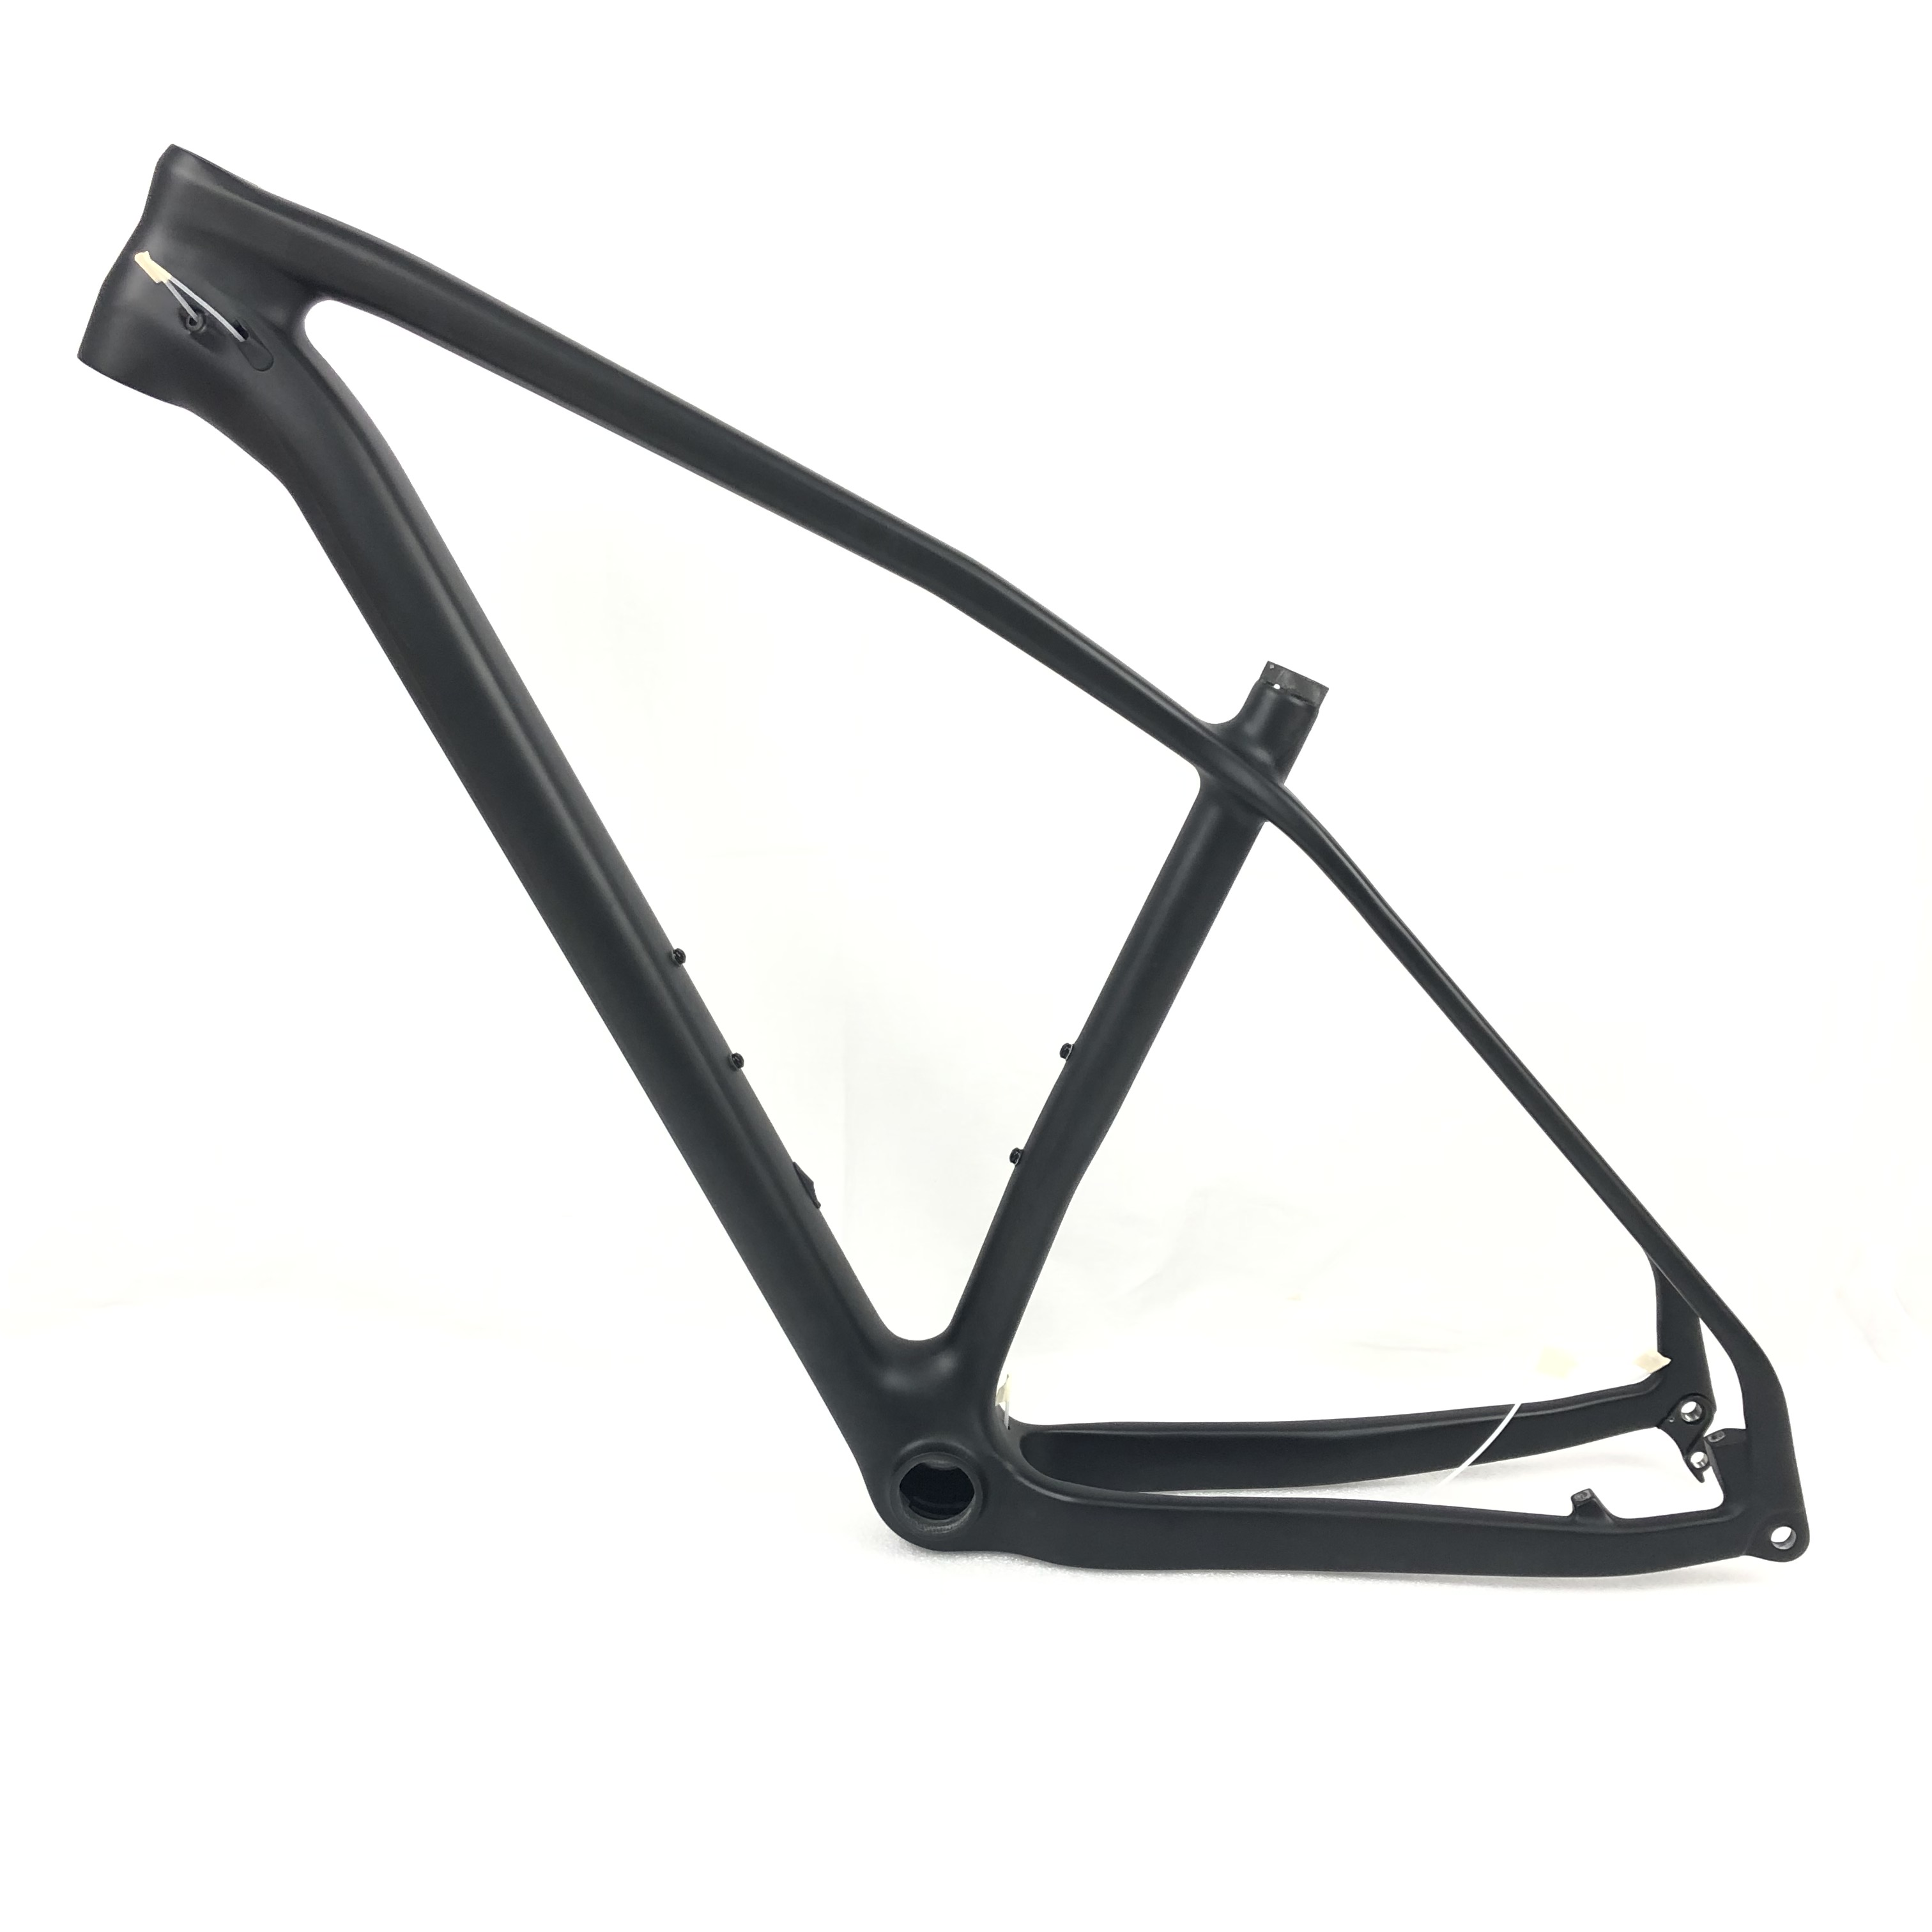 Hongfu mtb carbon frame 29er hardtail bike frame bb92 named FM199-B, N/a